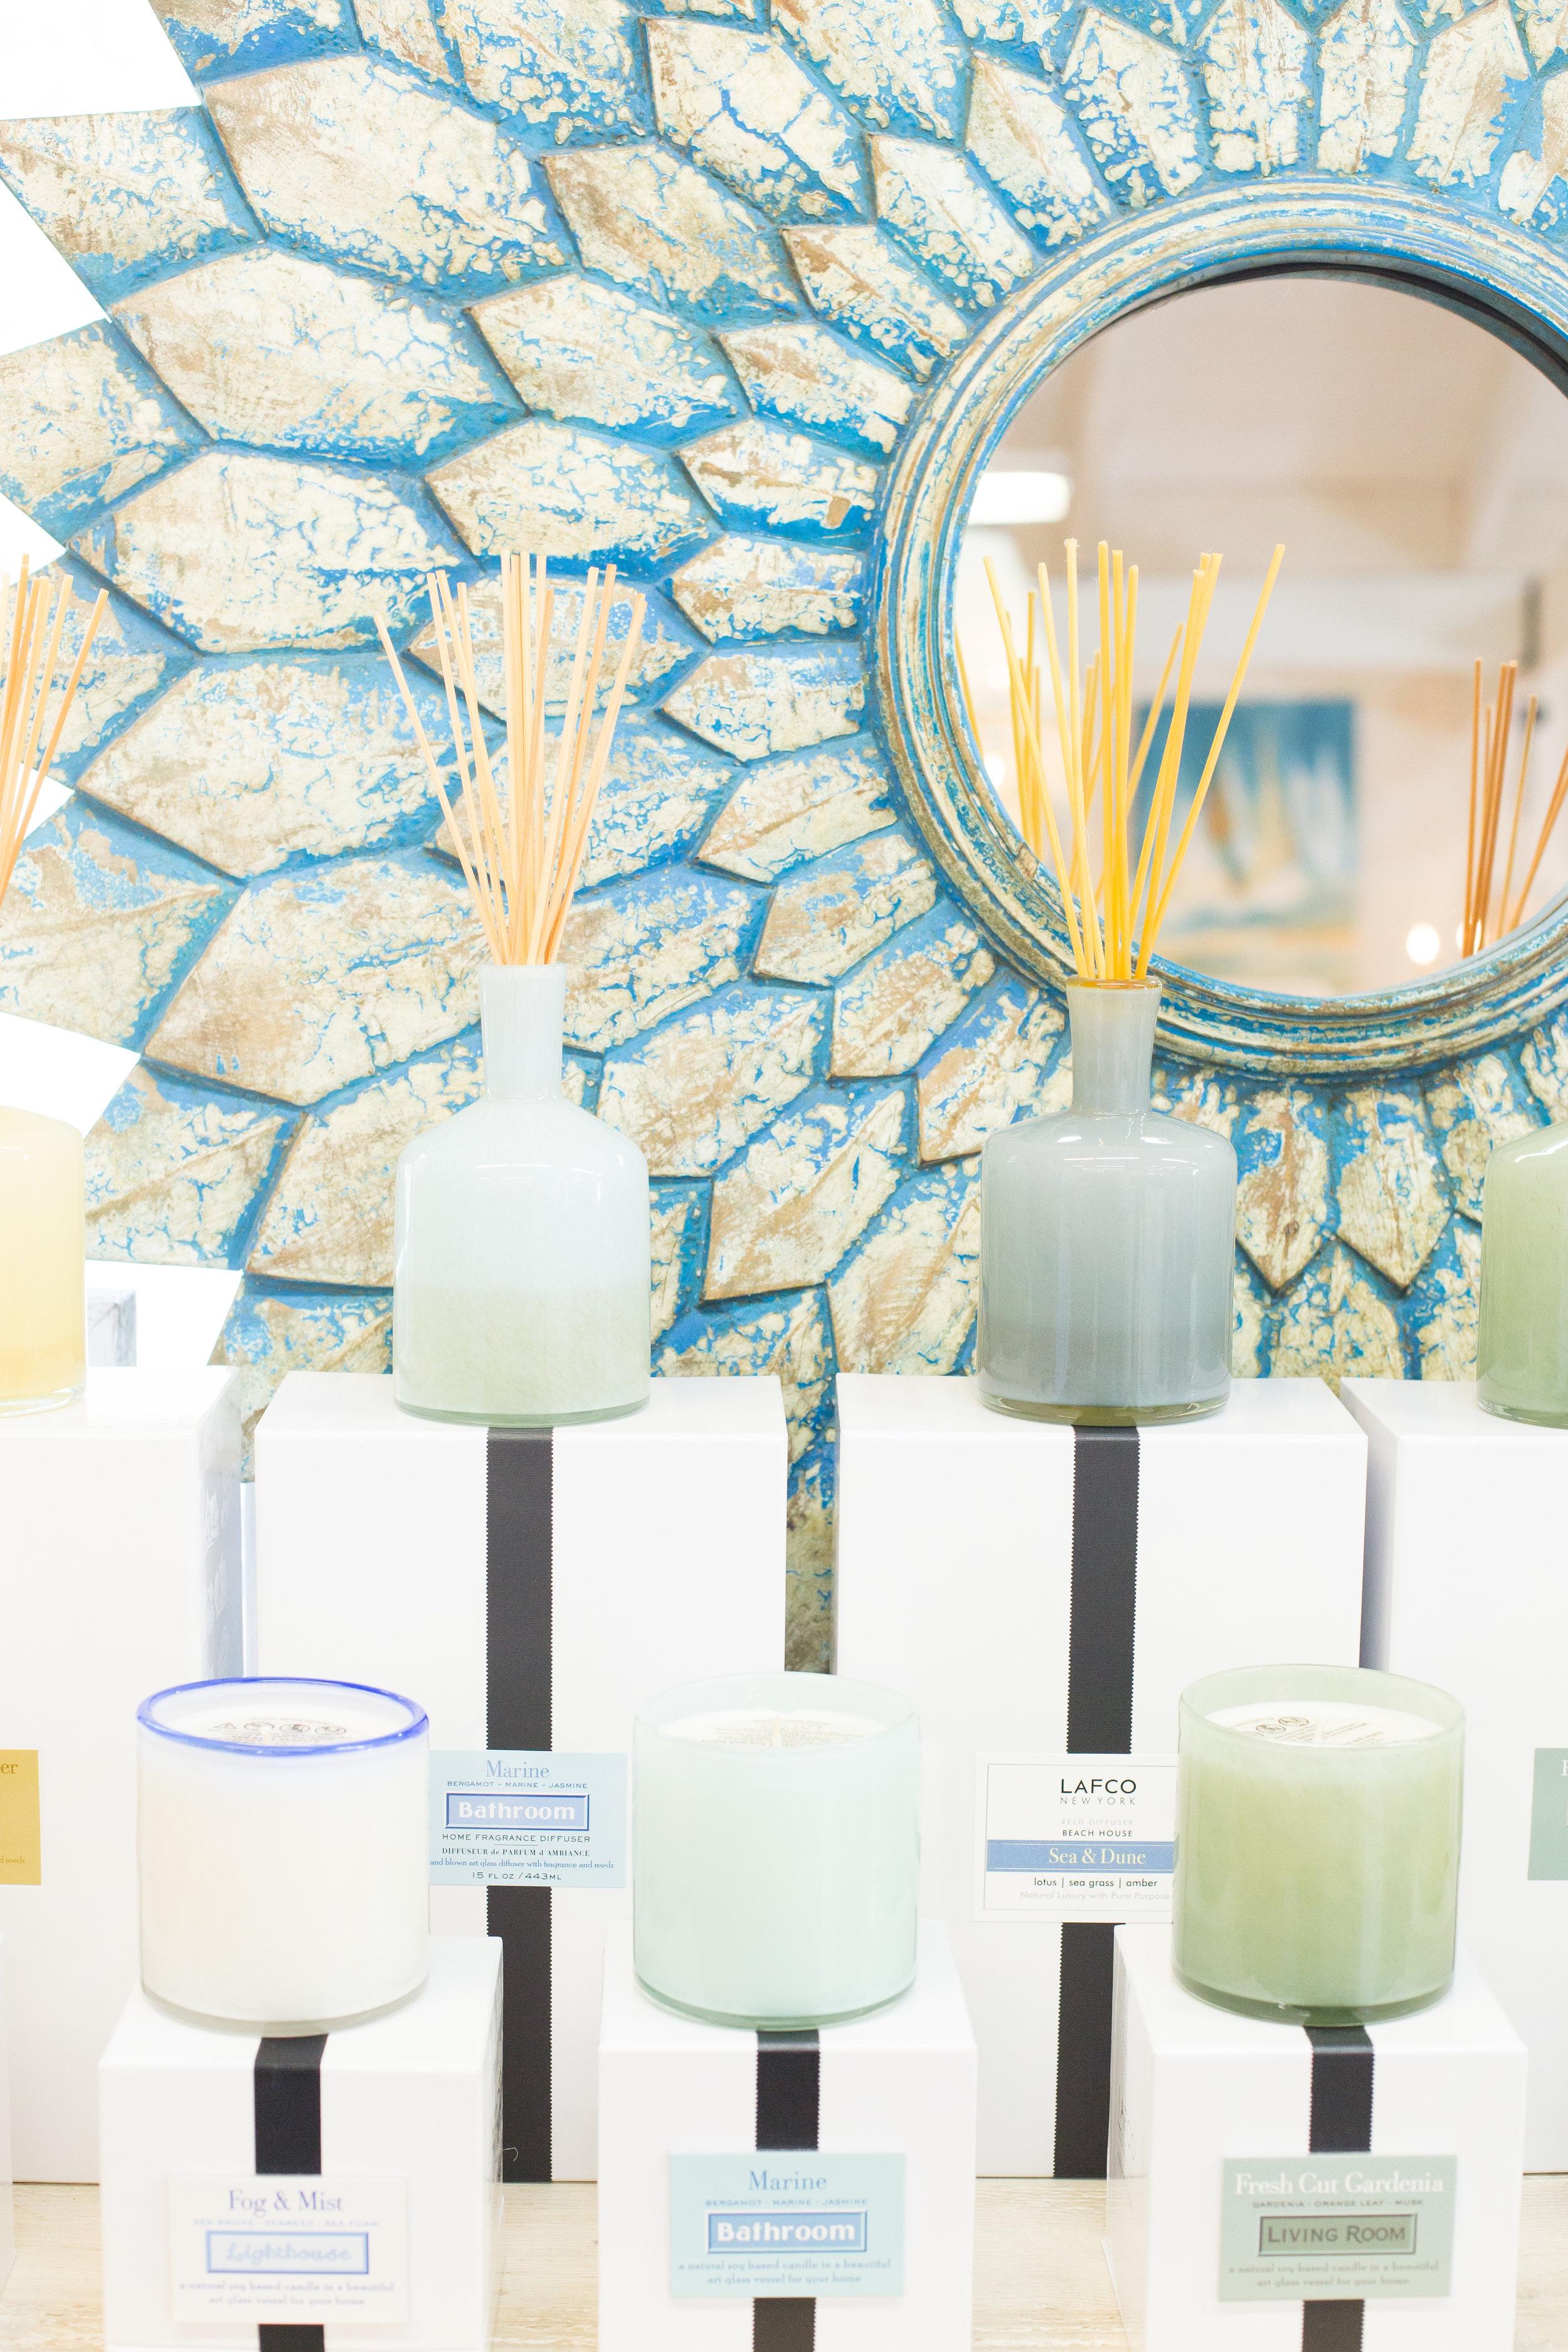 Sunburst mirror, turquoise candles